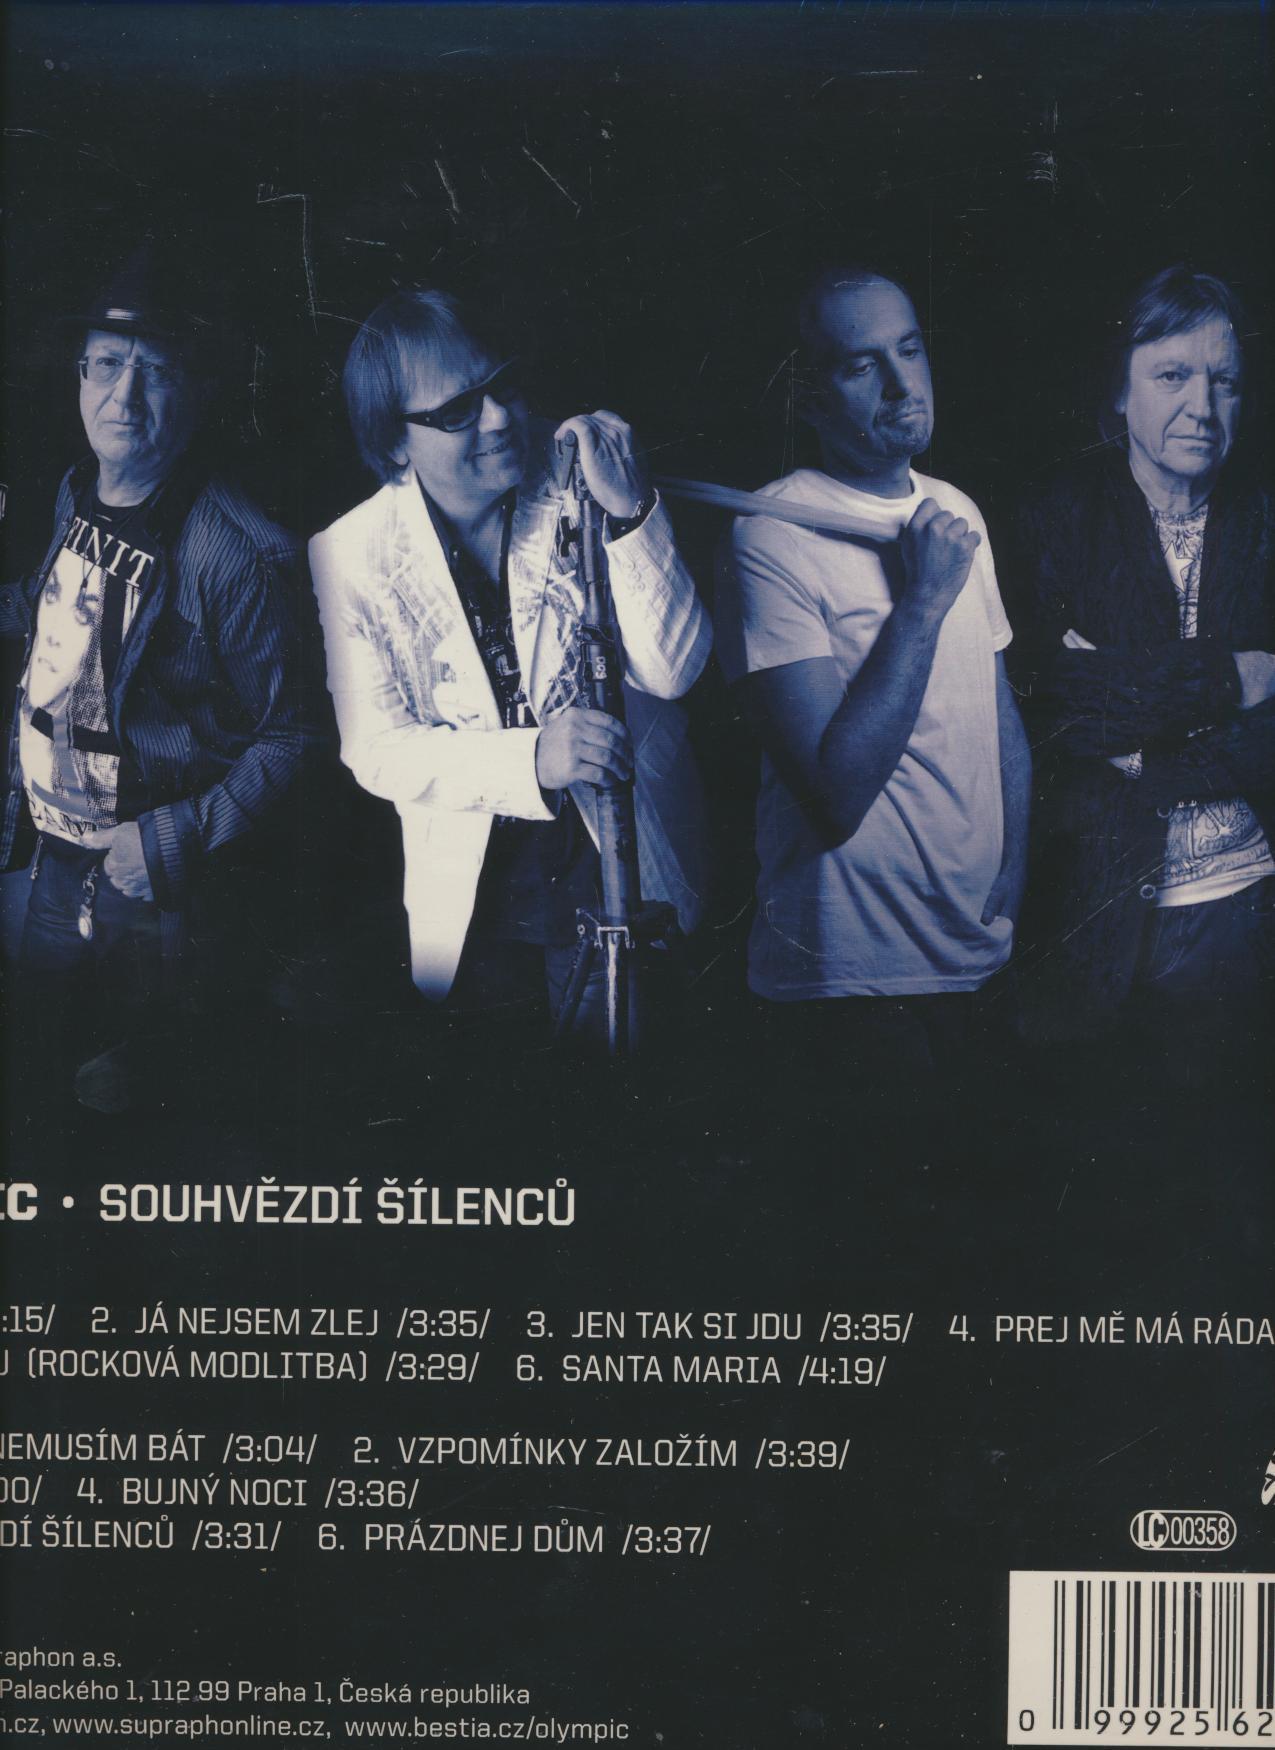 SOUHVEZDI SILENCU /VINYL/ - supershop.sk